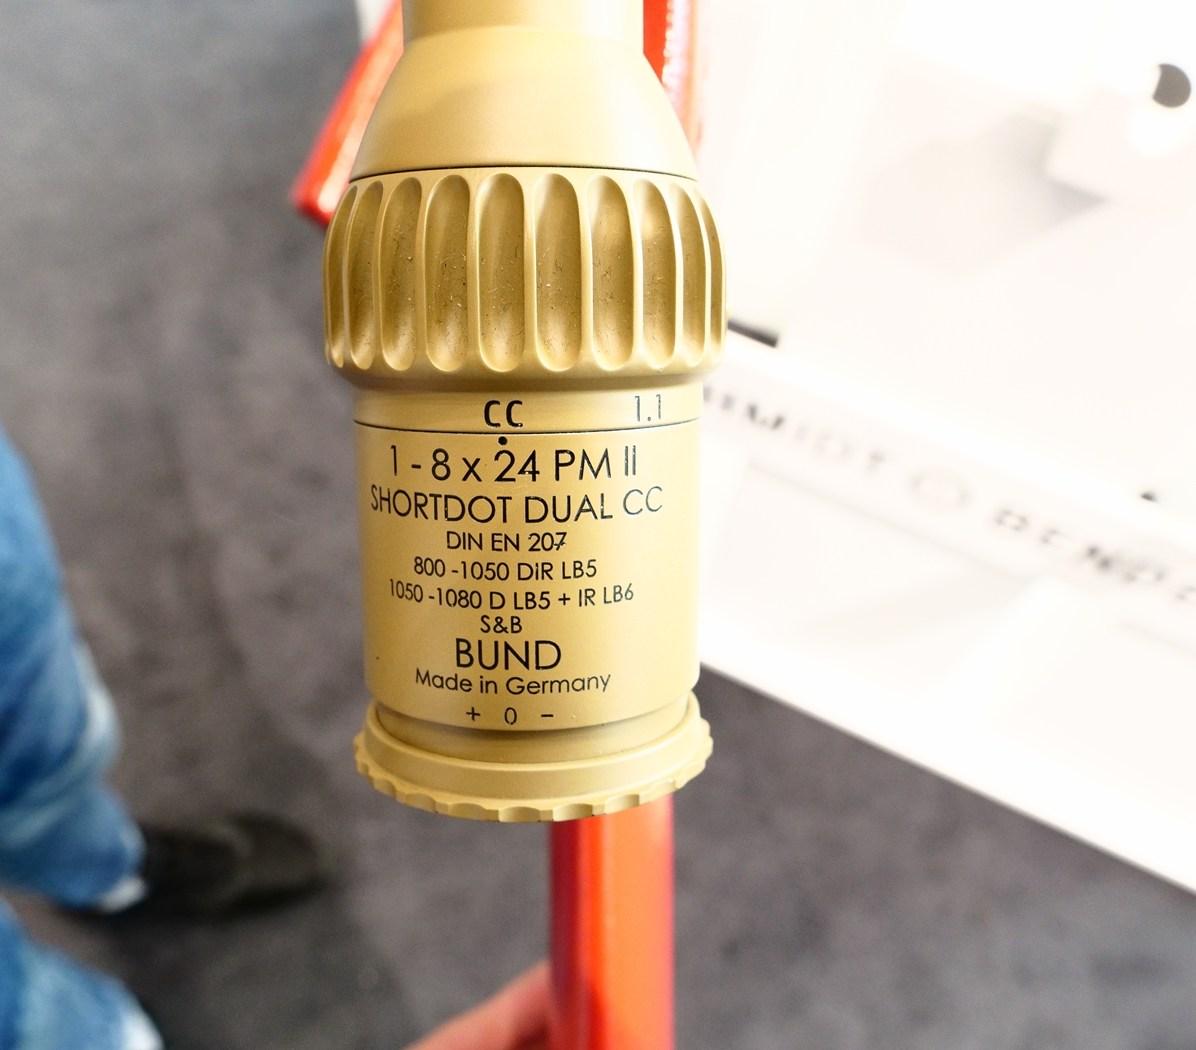 S&B ShortDot PM II Dual CC 1-8x24